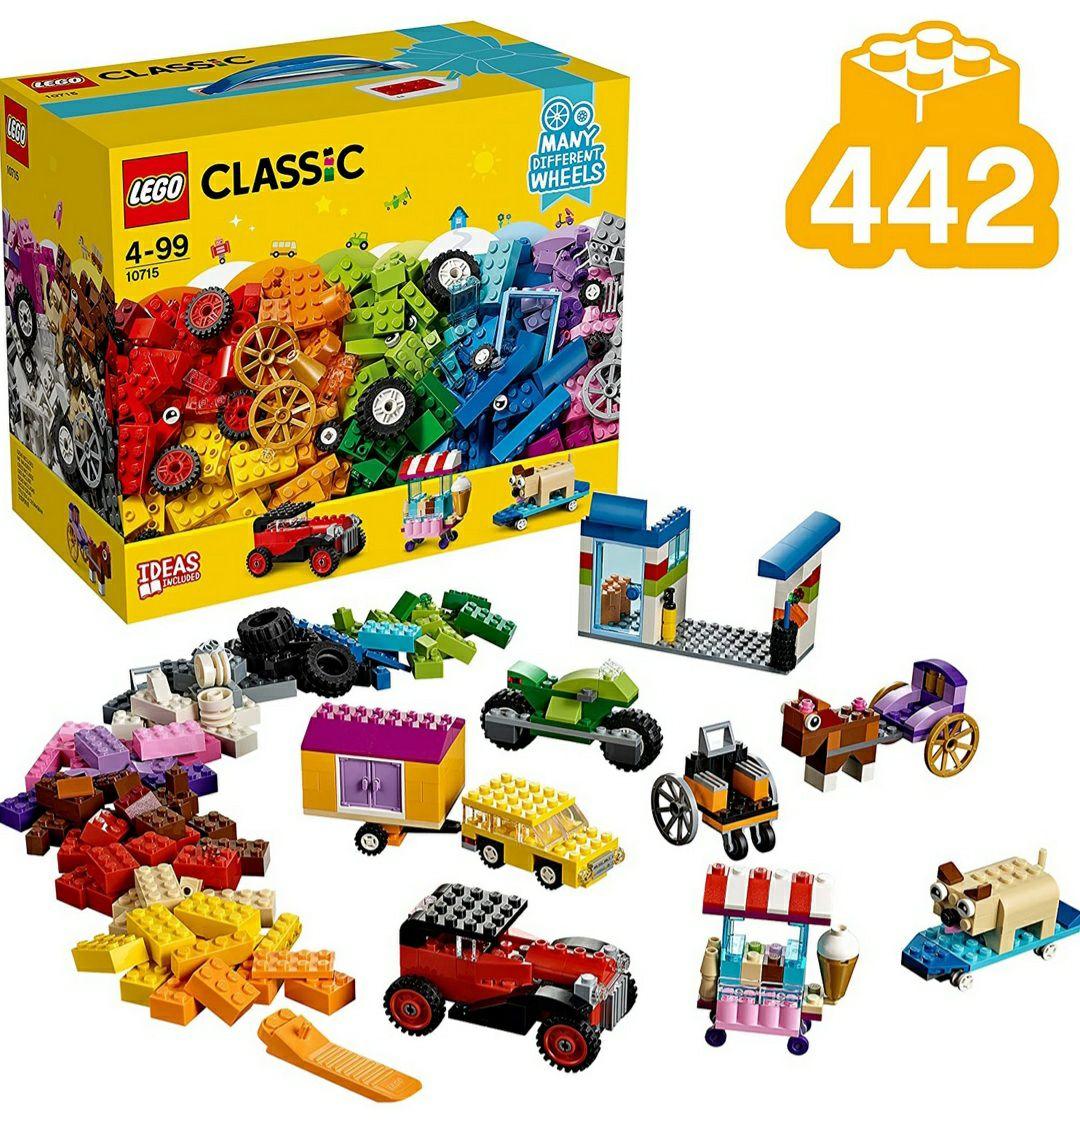 (PRIME) LEGO Classic - Kreativ-Bauset Fahrzeuge 10715